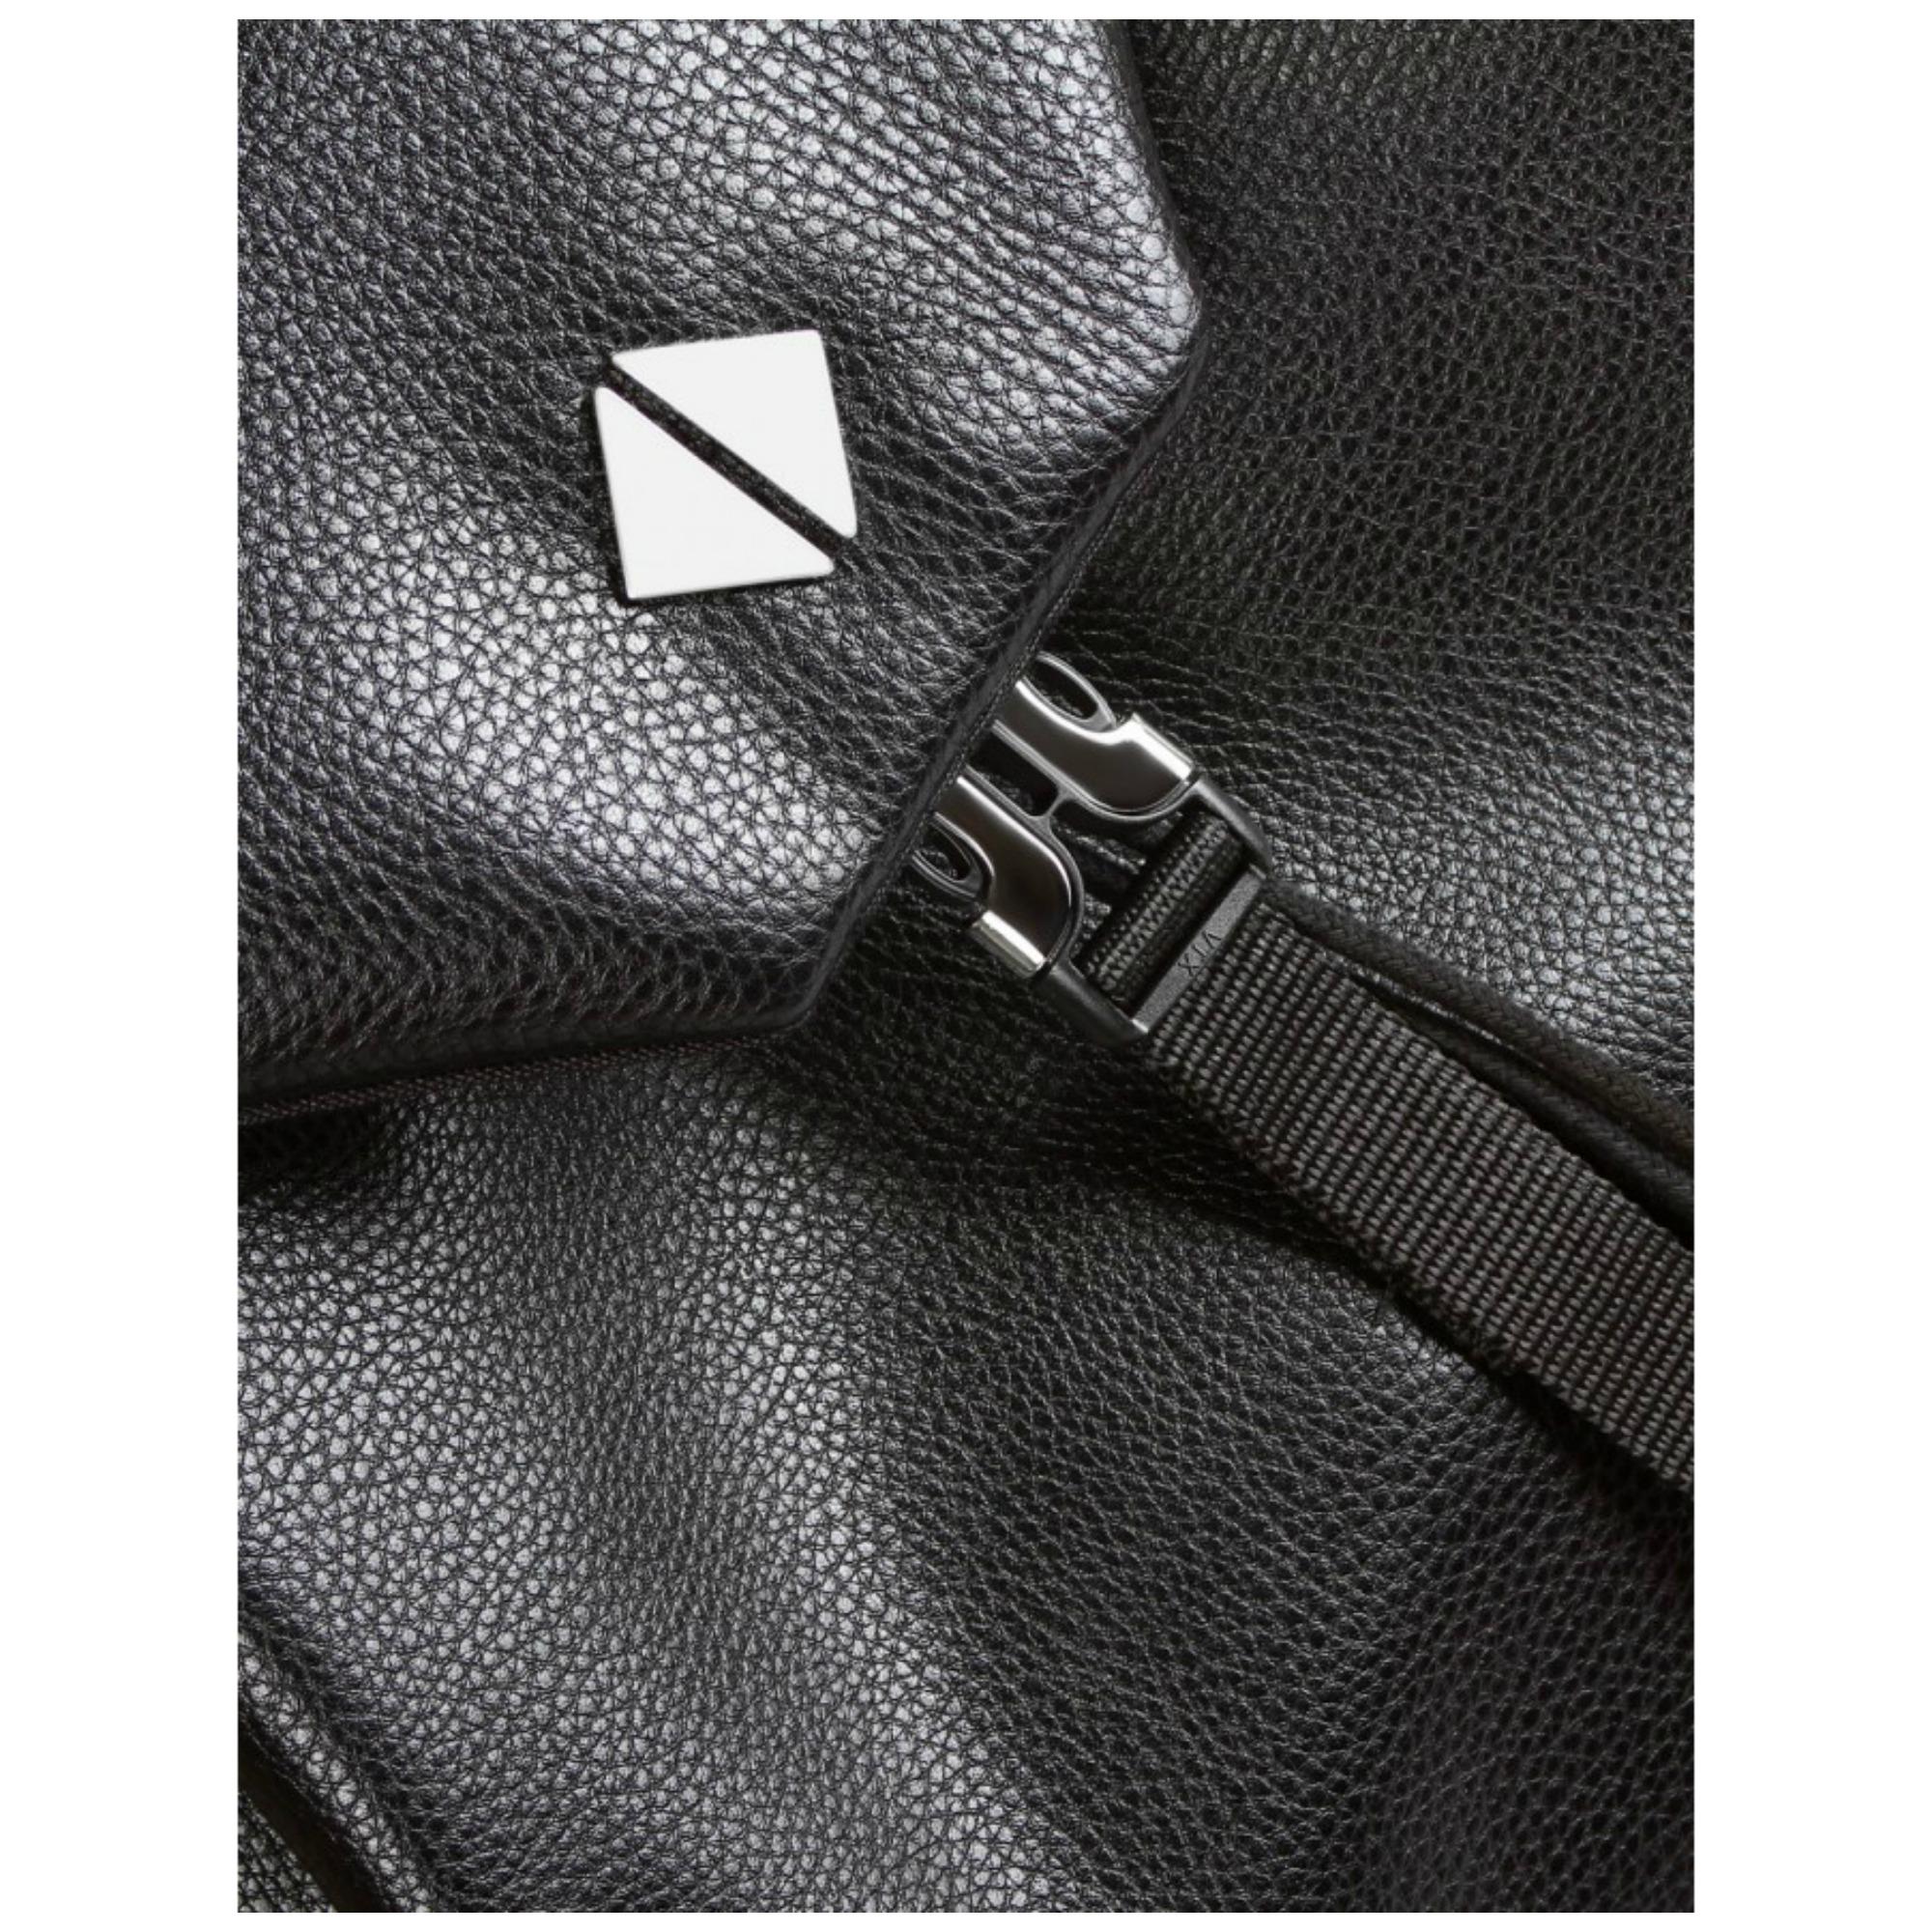 twinsaciton backpack